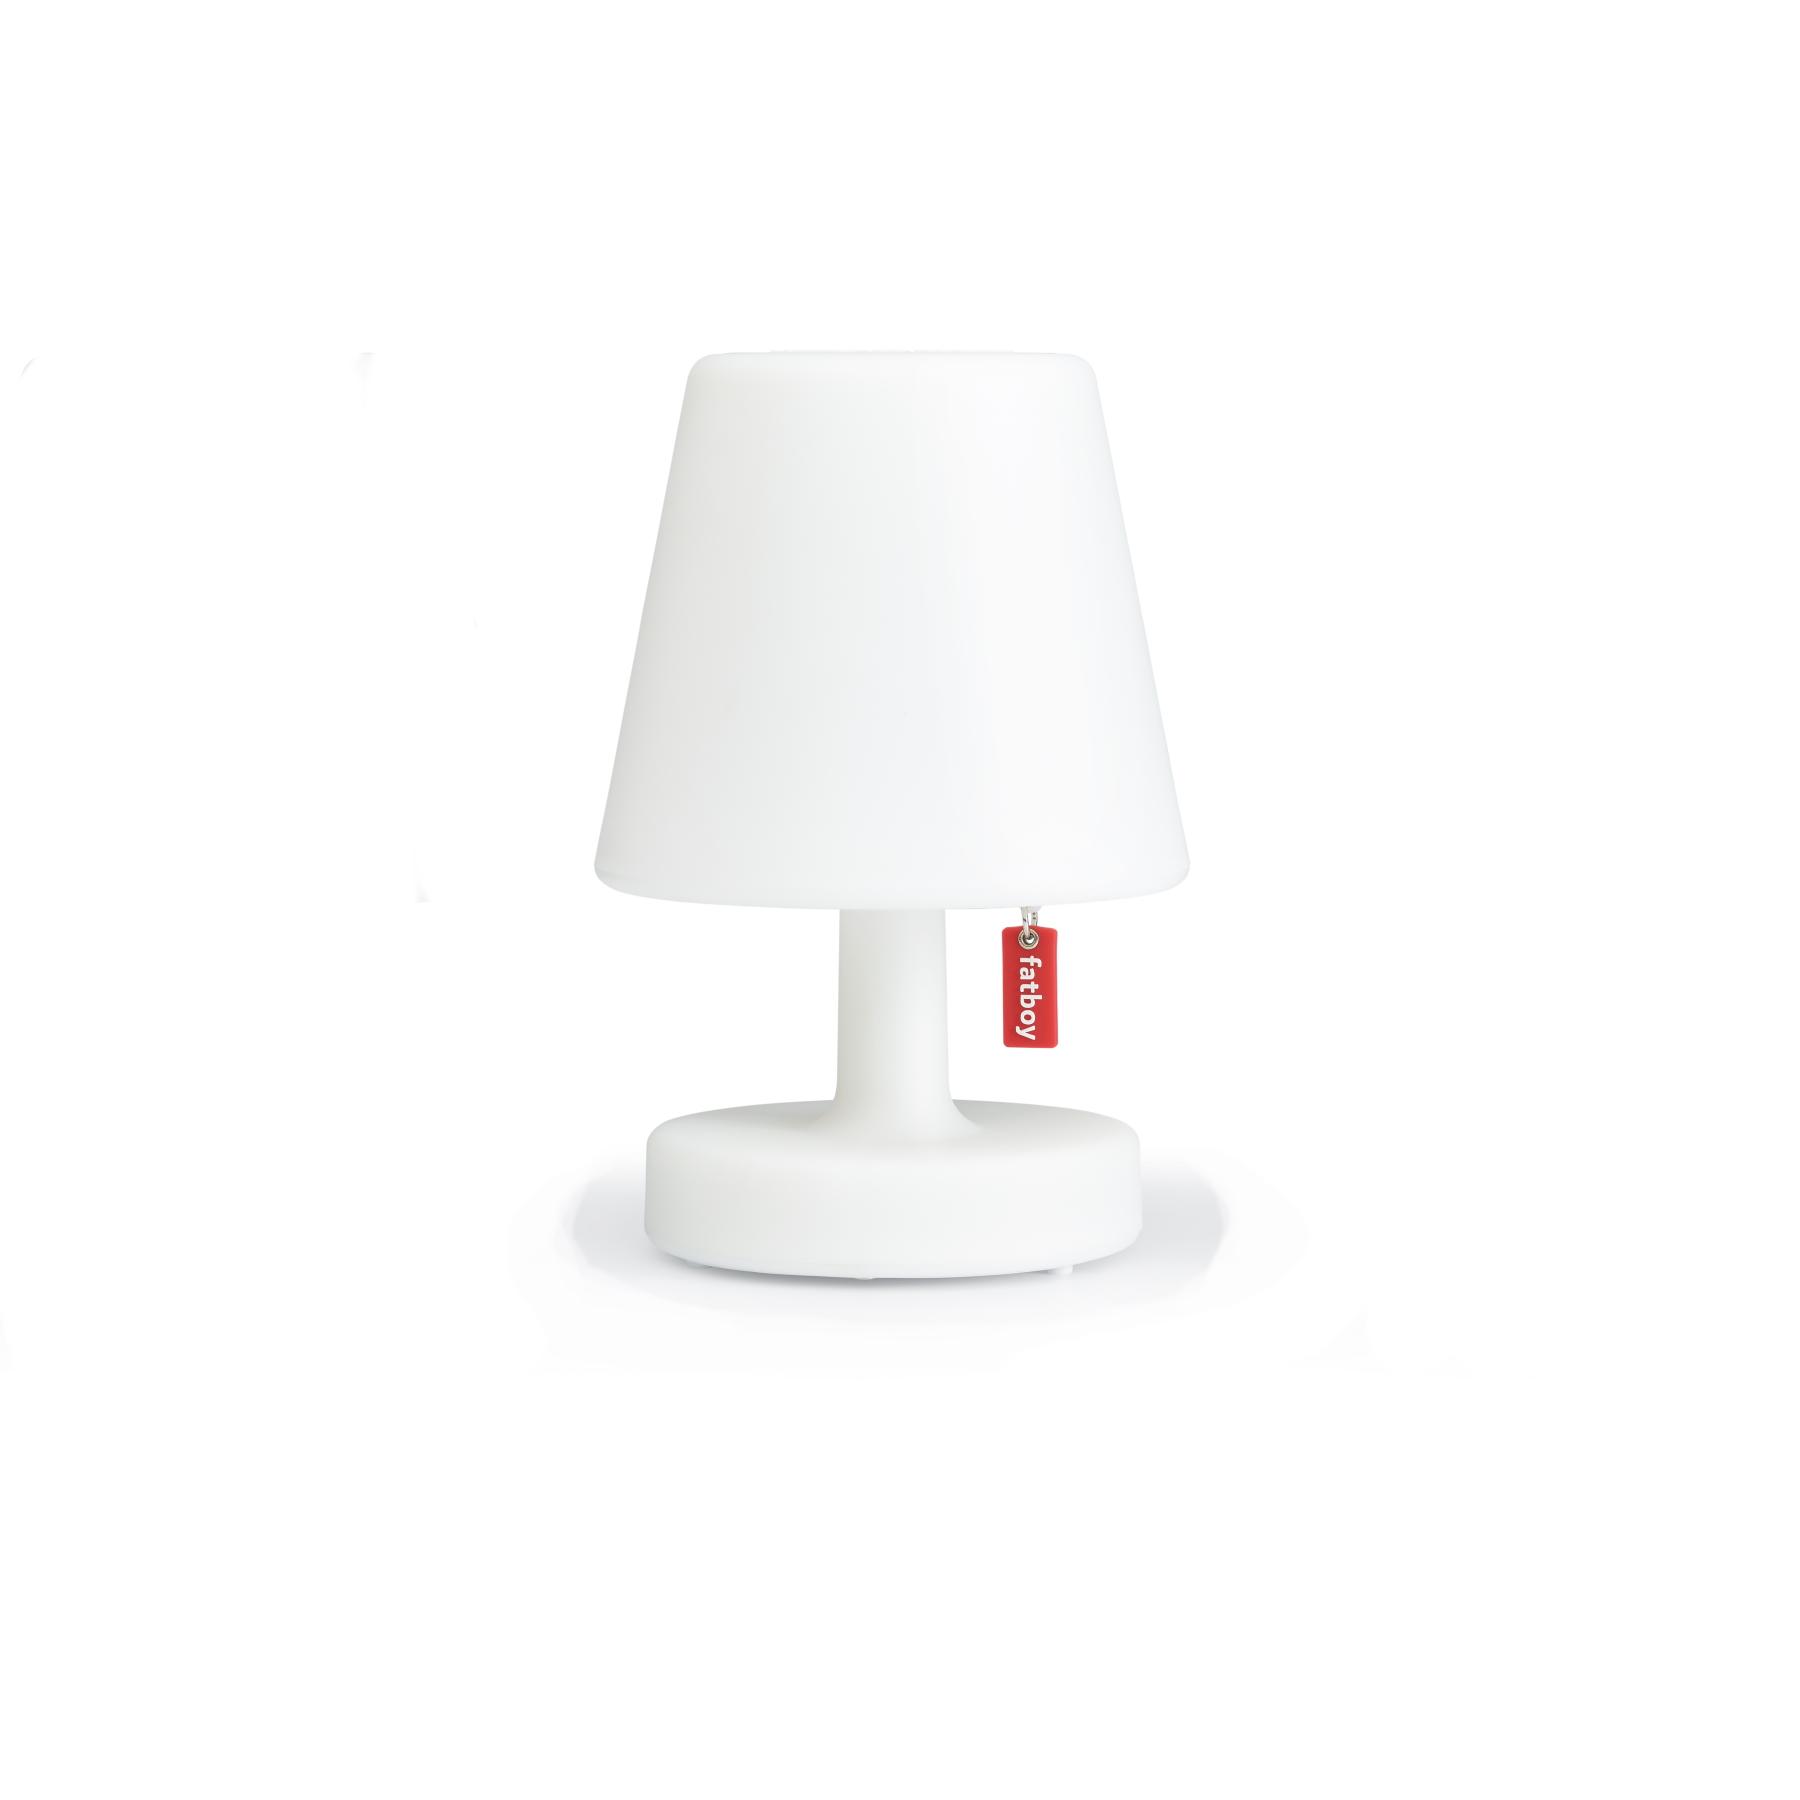 Fatboy® Edison the Petit bordslampa utomhus